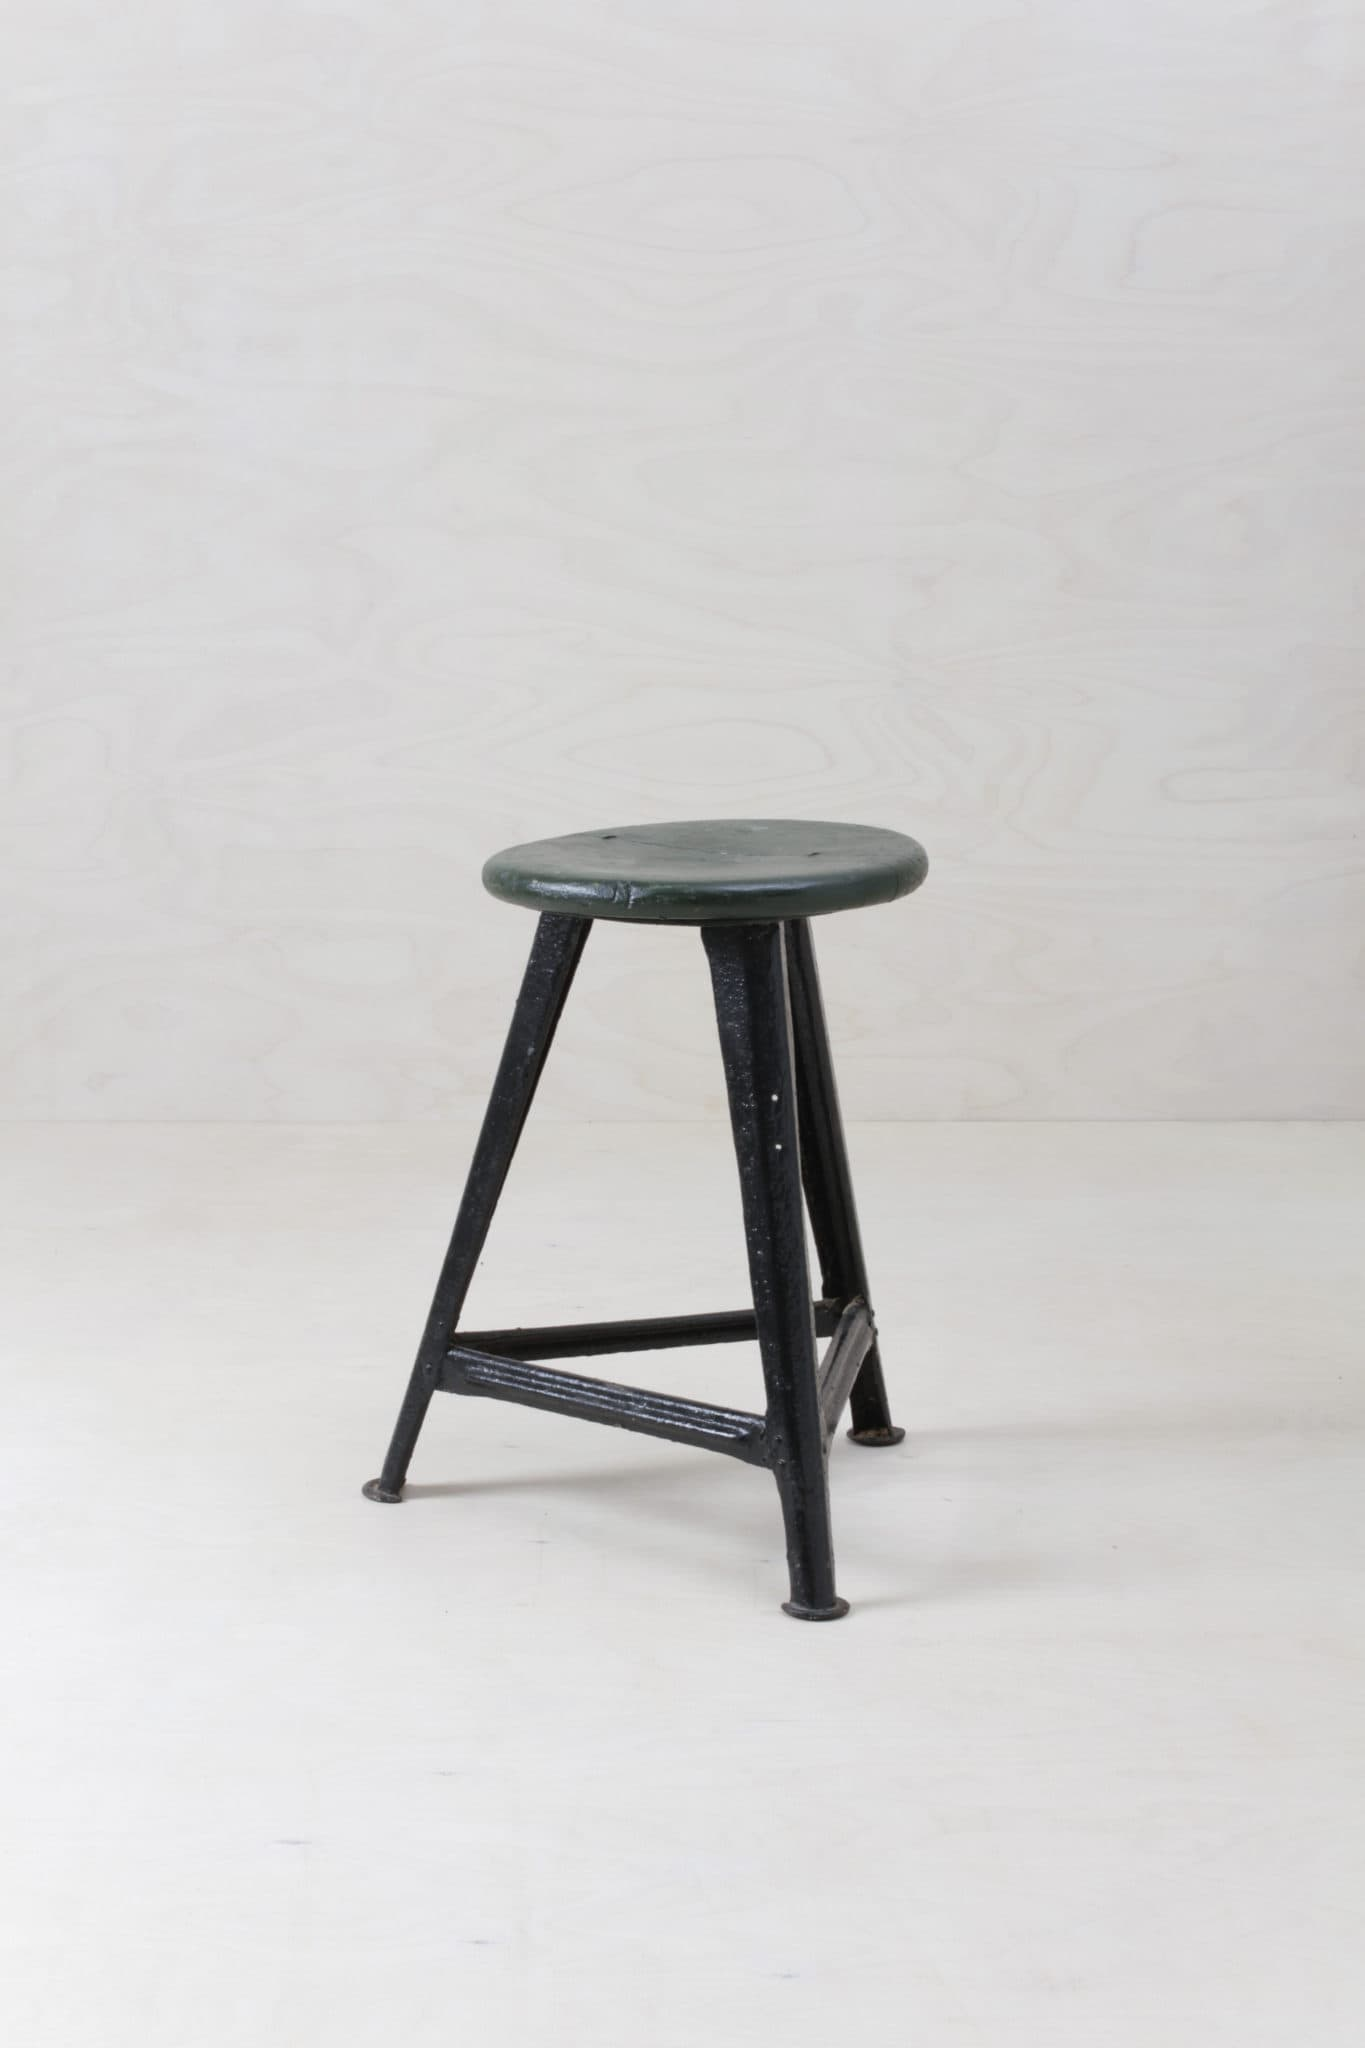 Hocker, Stühle, Sessel, Bänke, Vintage Modern zu mieten